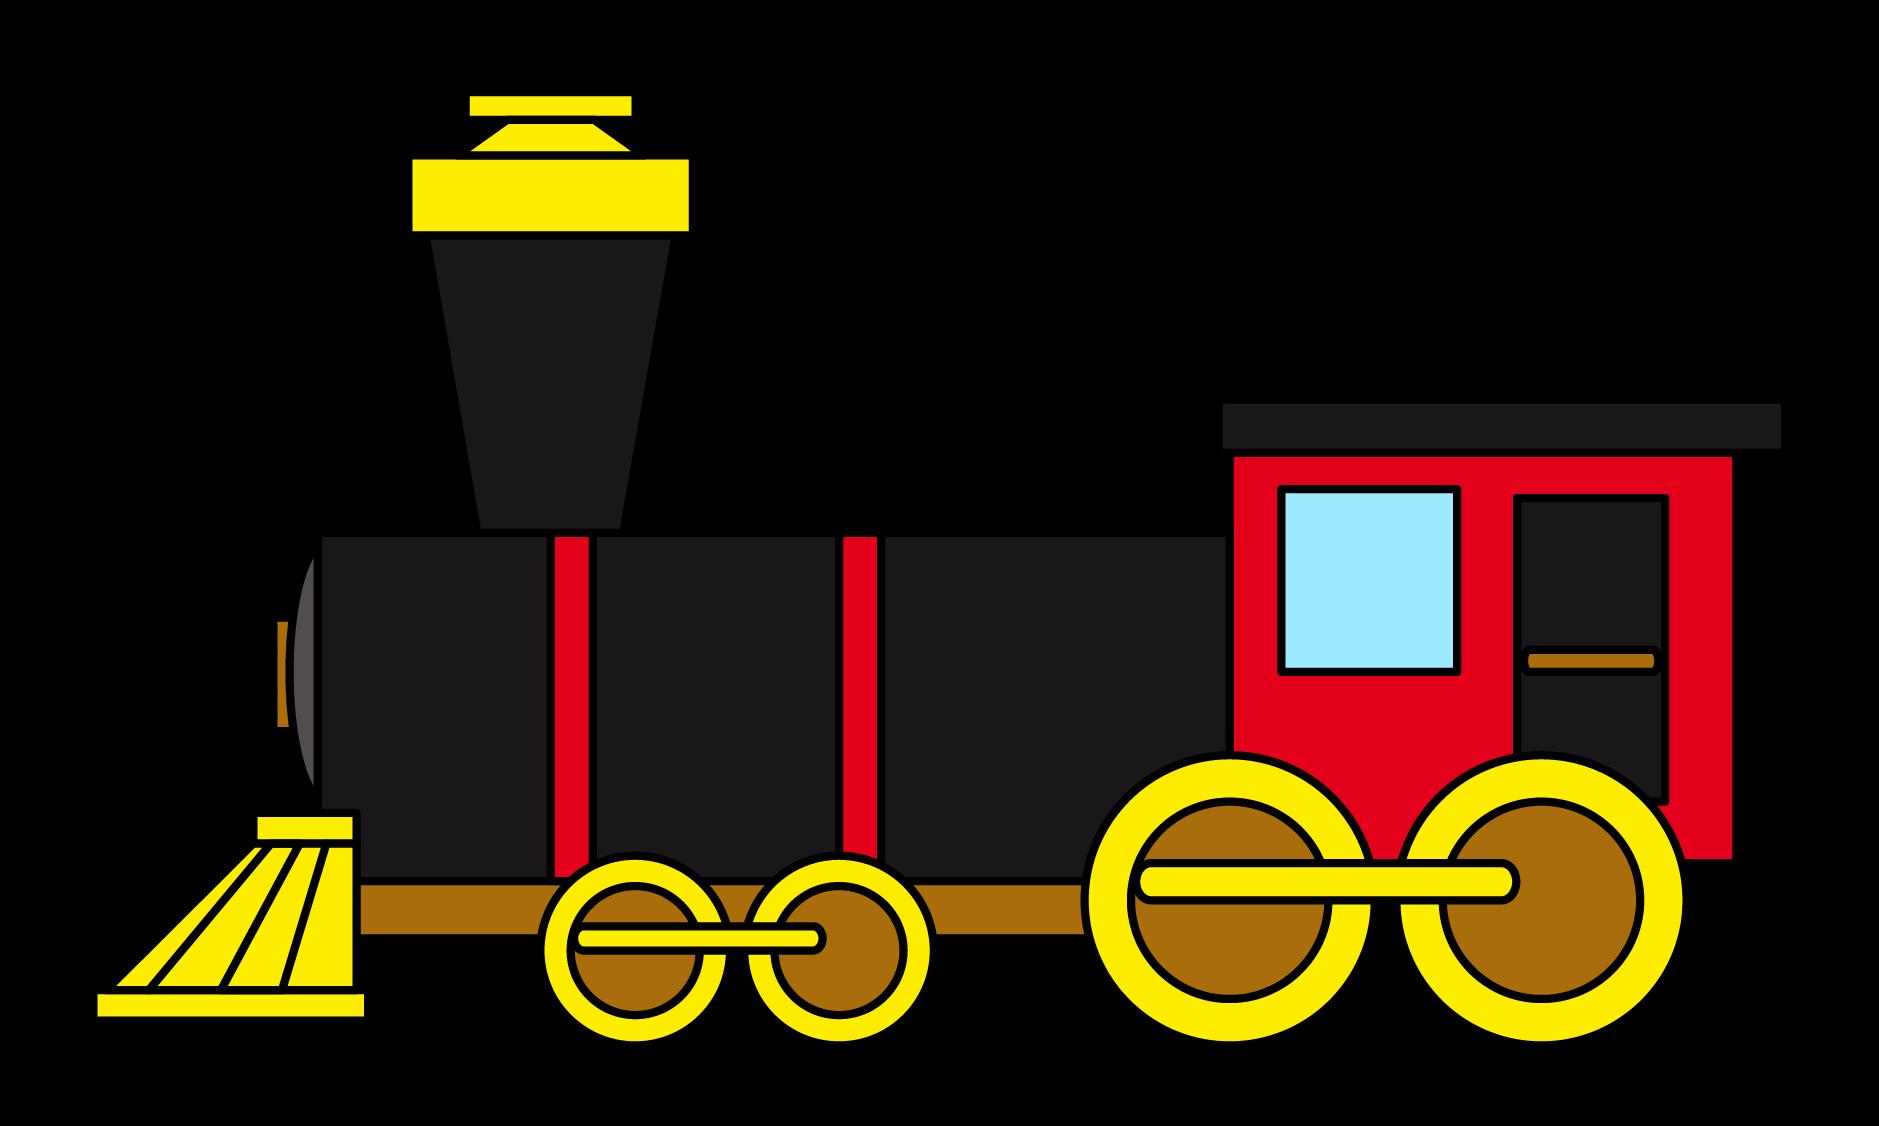 Free Cartoon Locomotive Clip Art-Free Cartoon Locomotive Clip Art-1